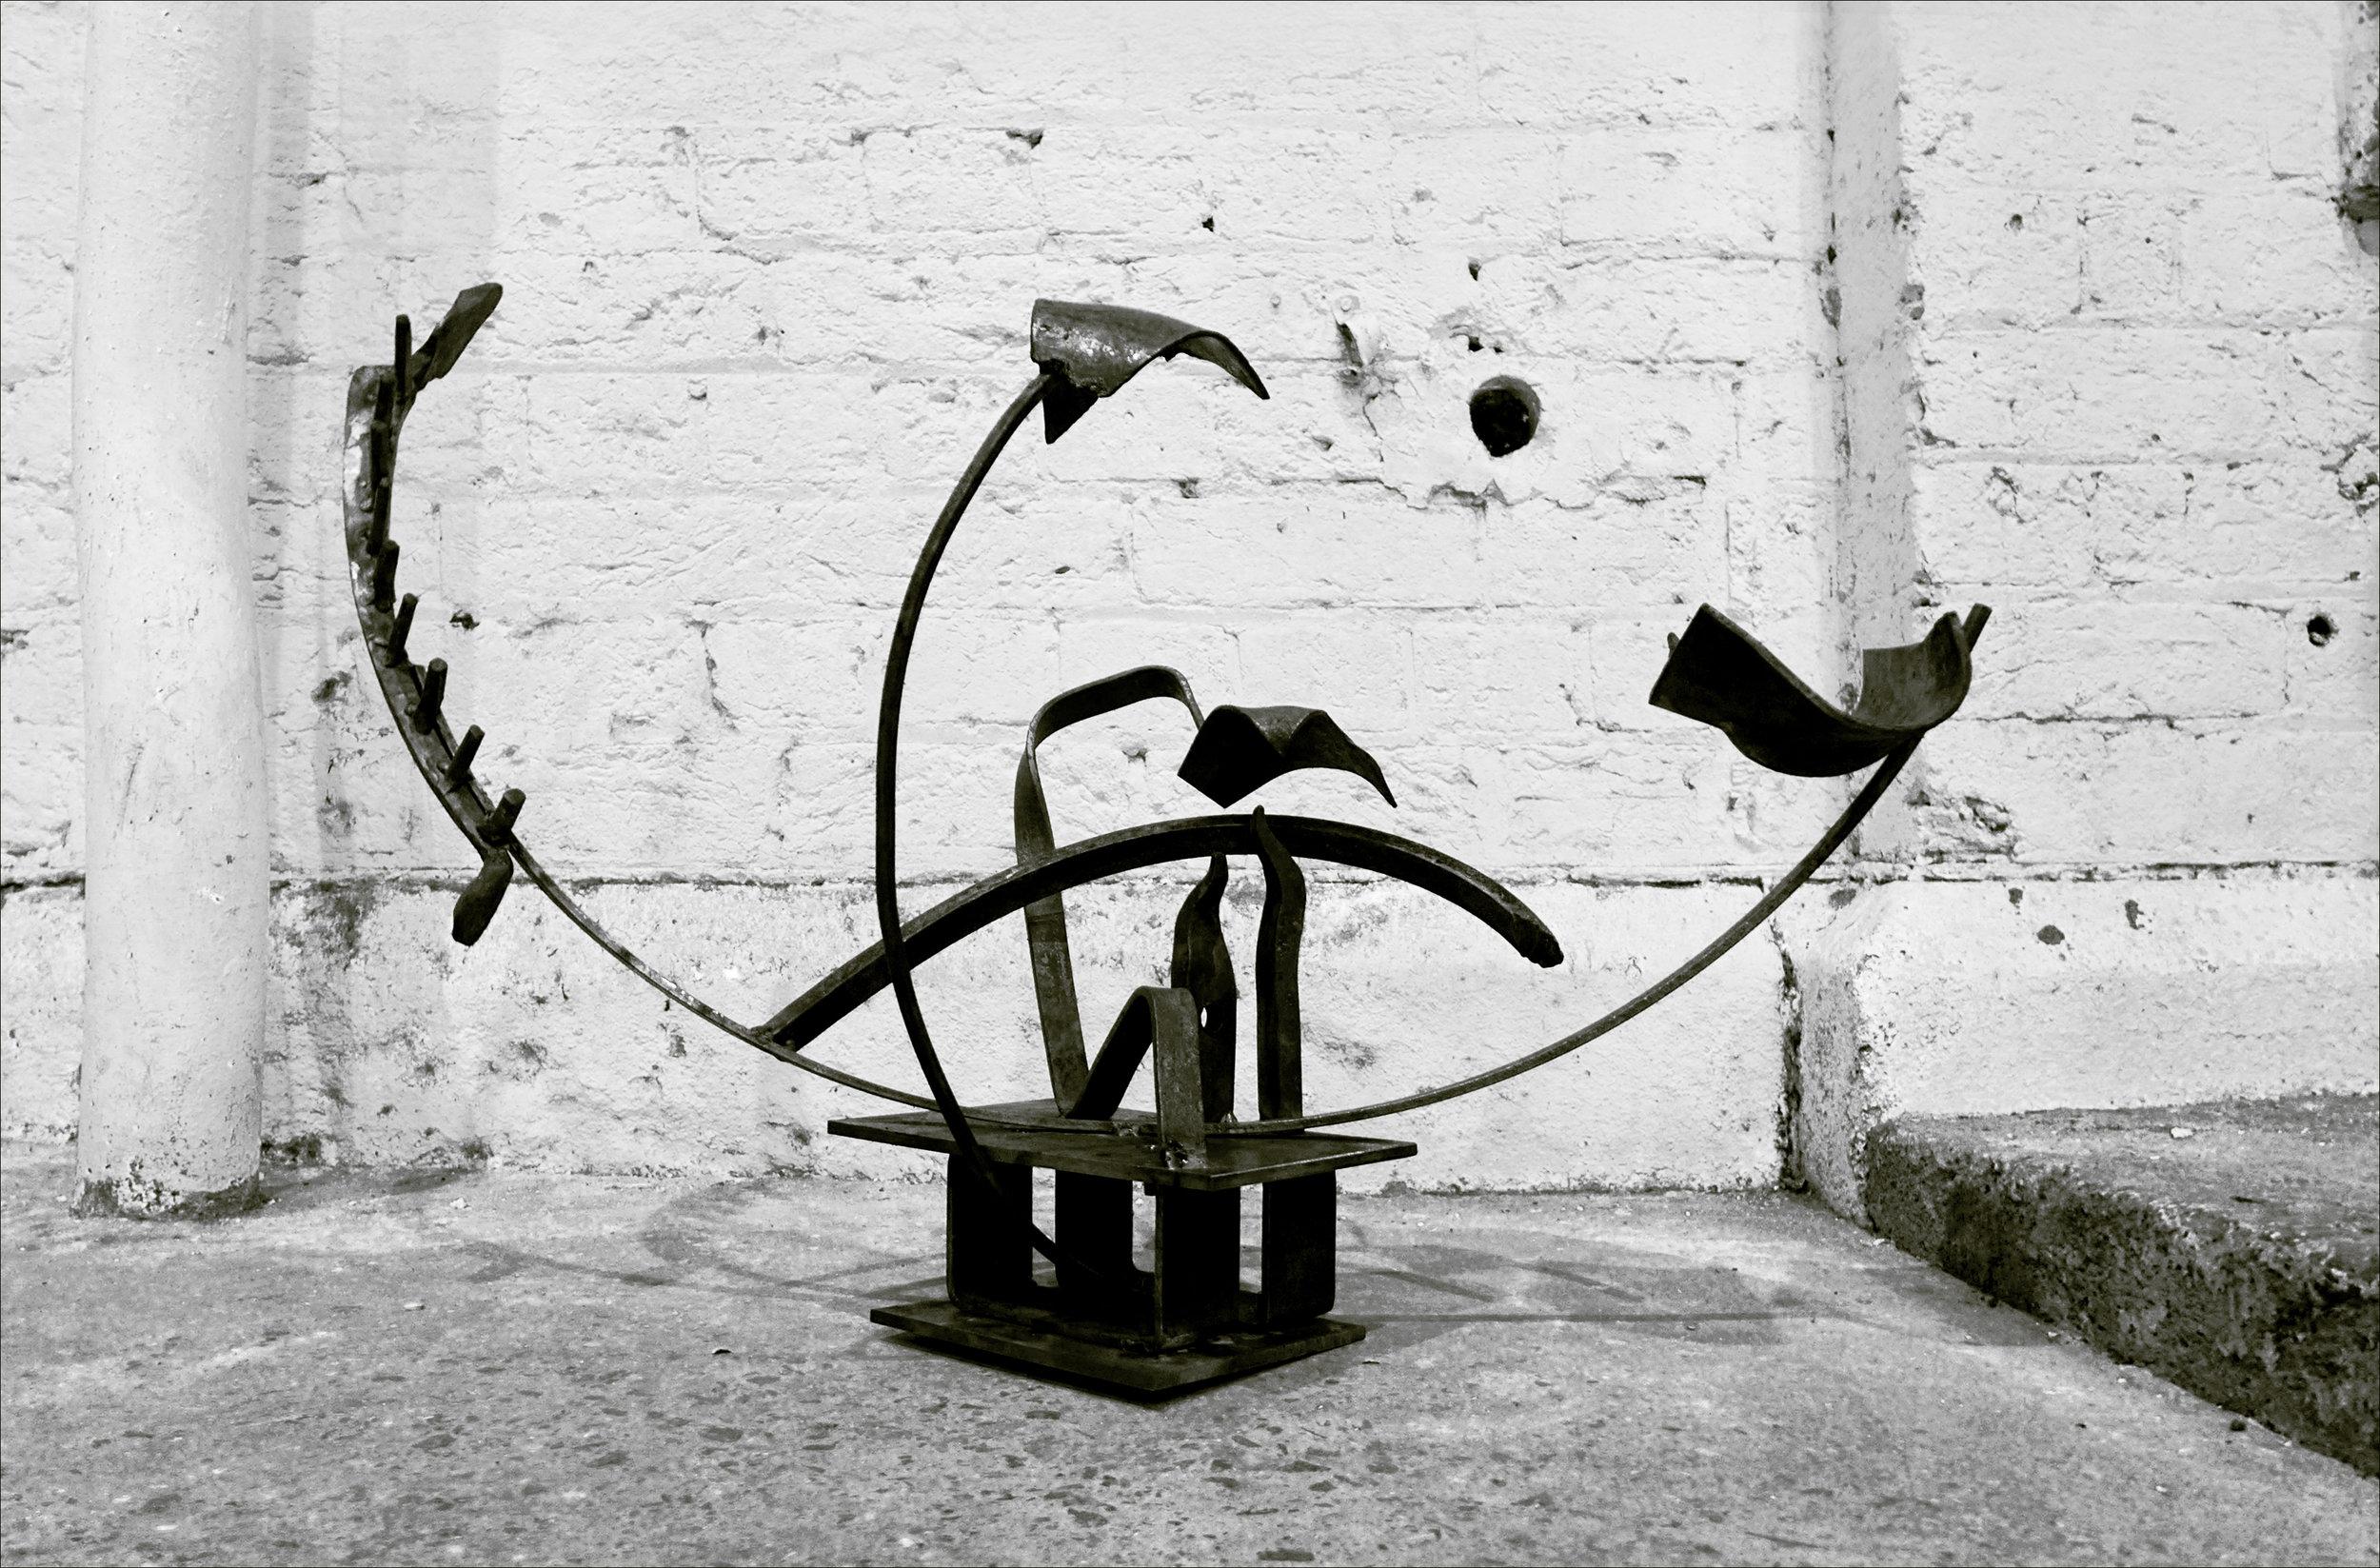 Metalwork for sculpture course in Sydney